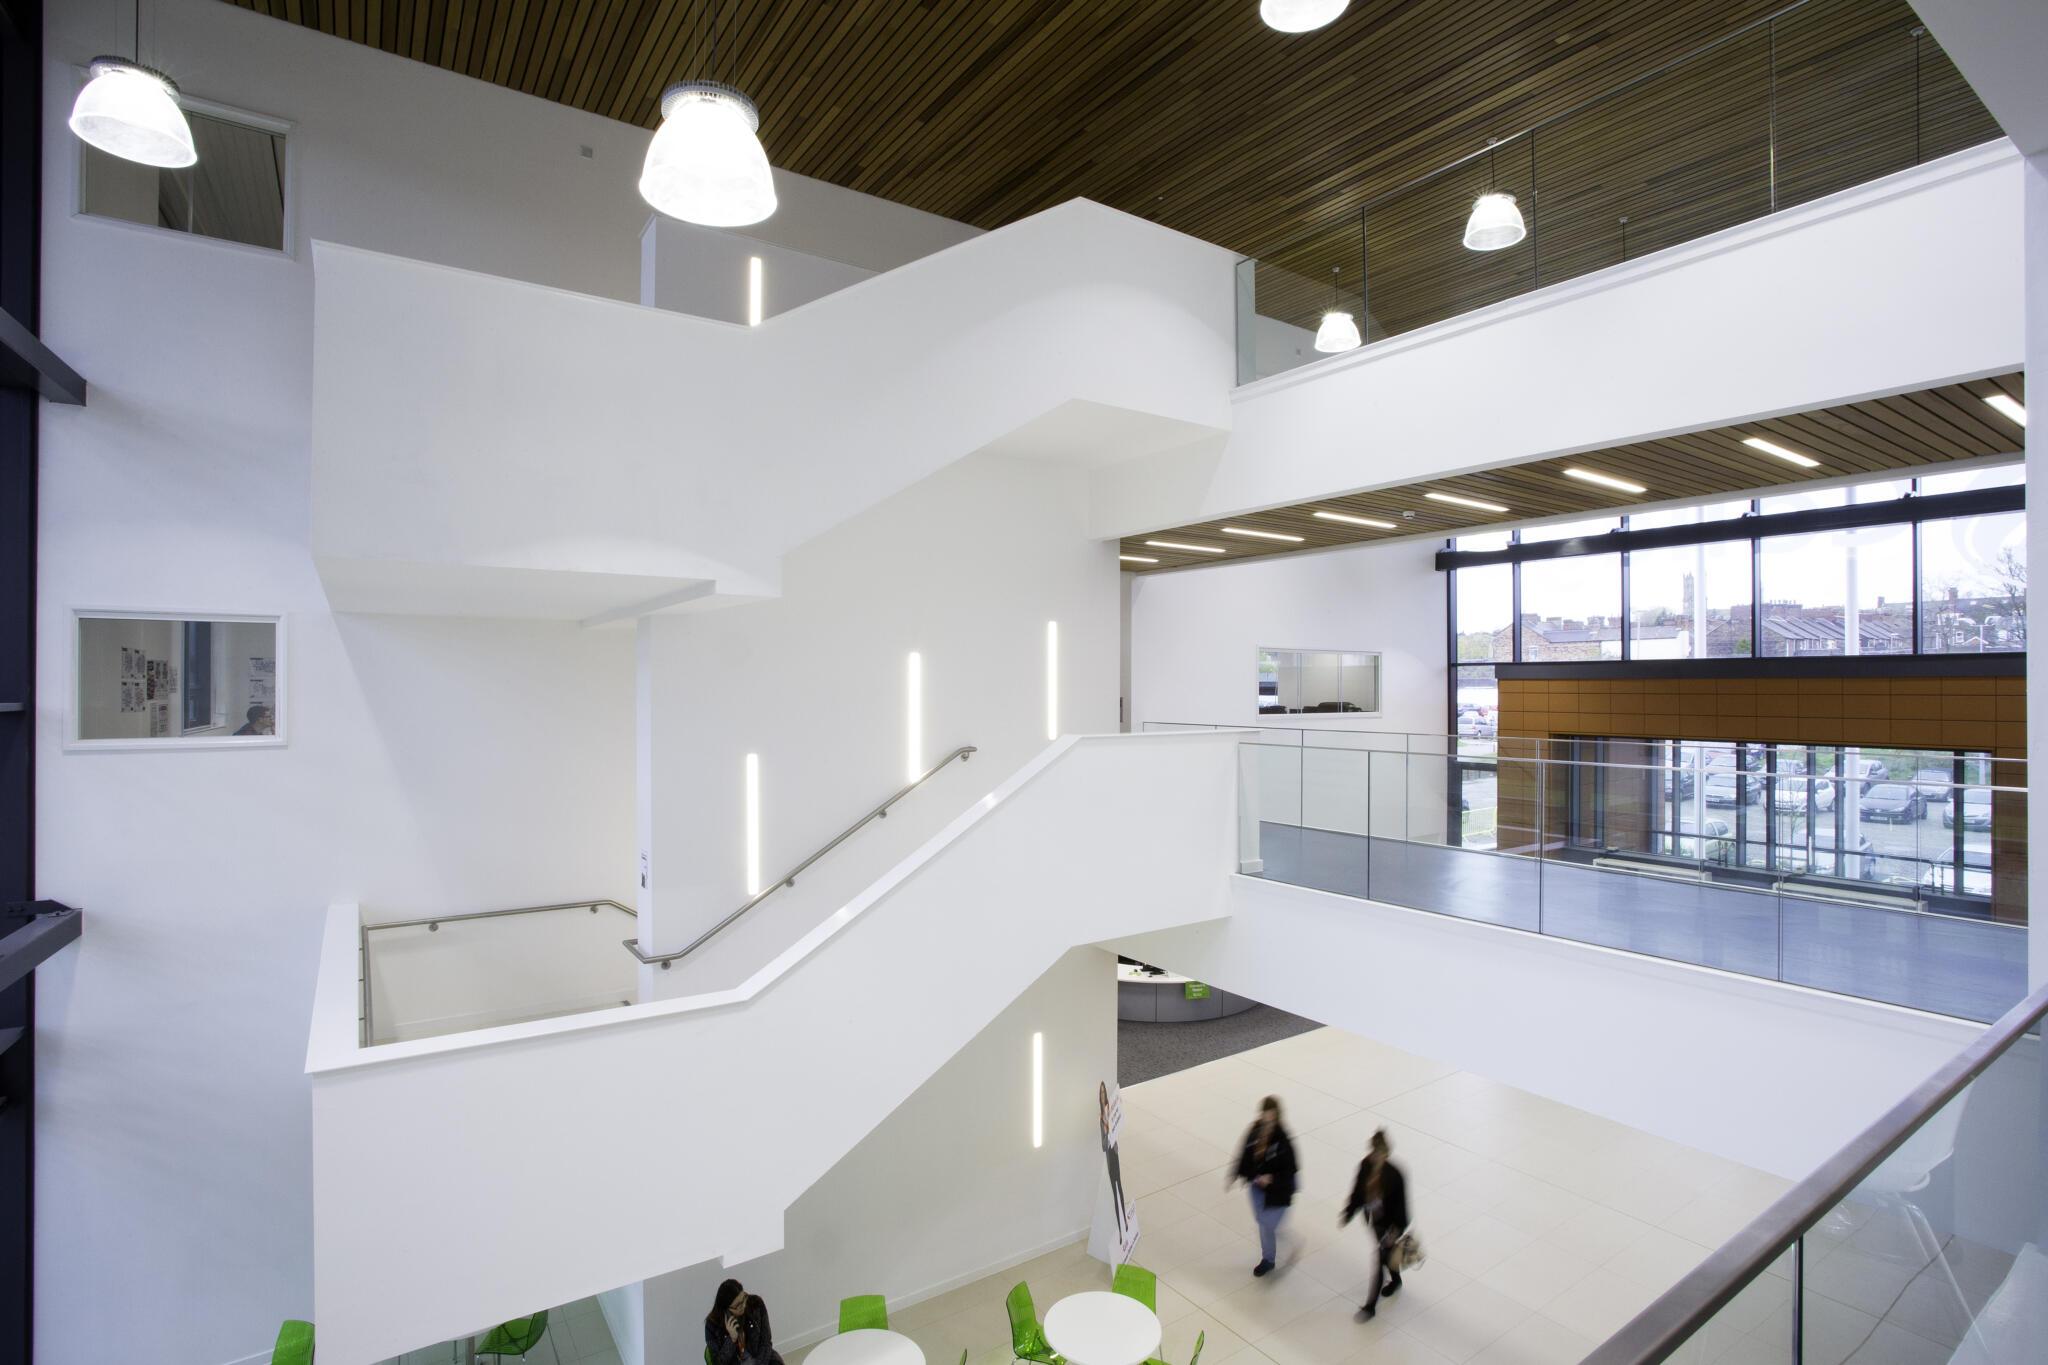 Stoke on Trent College - Cauldon Campus